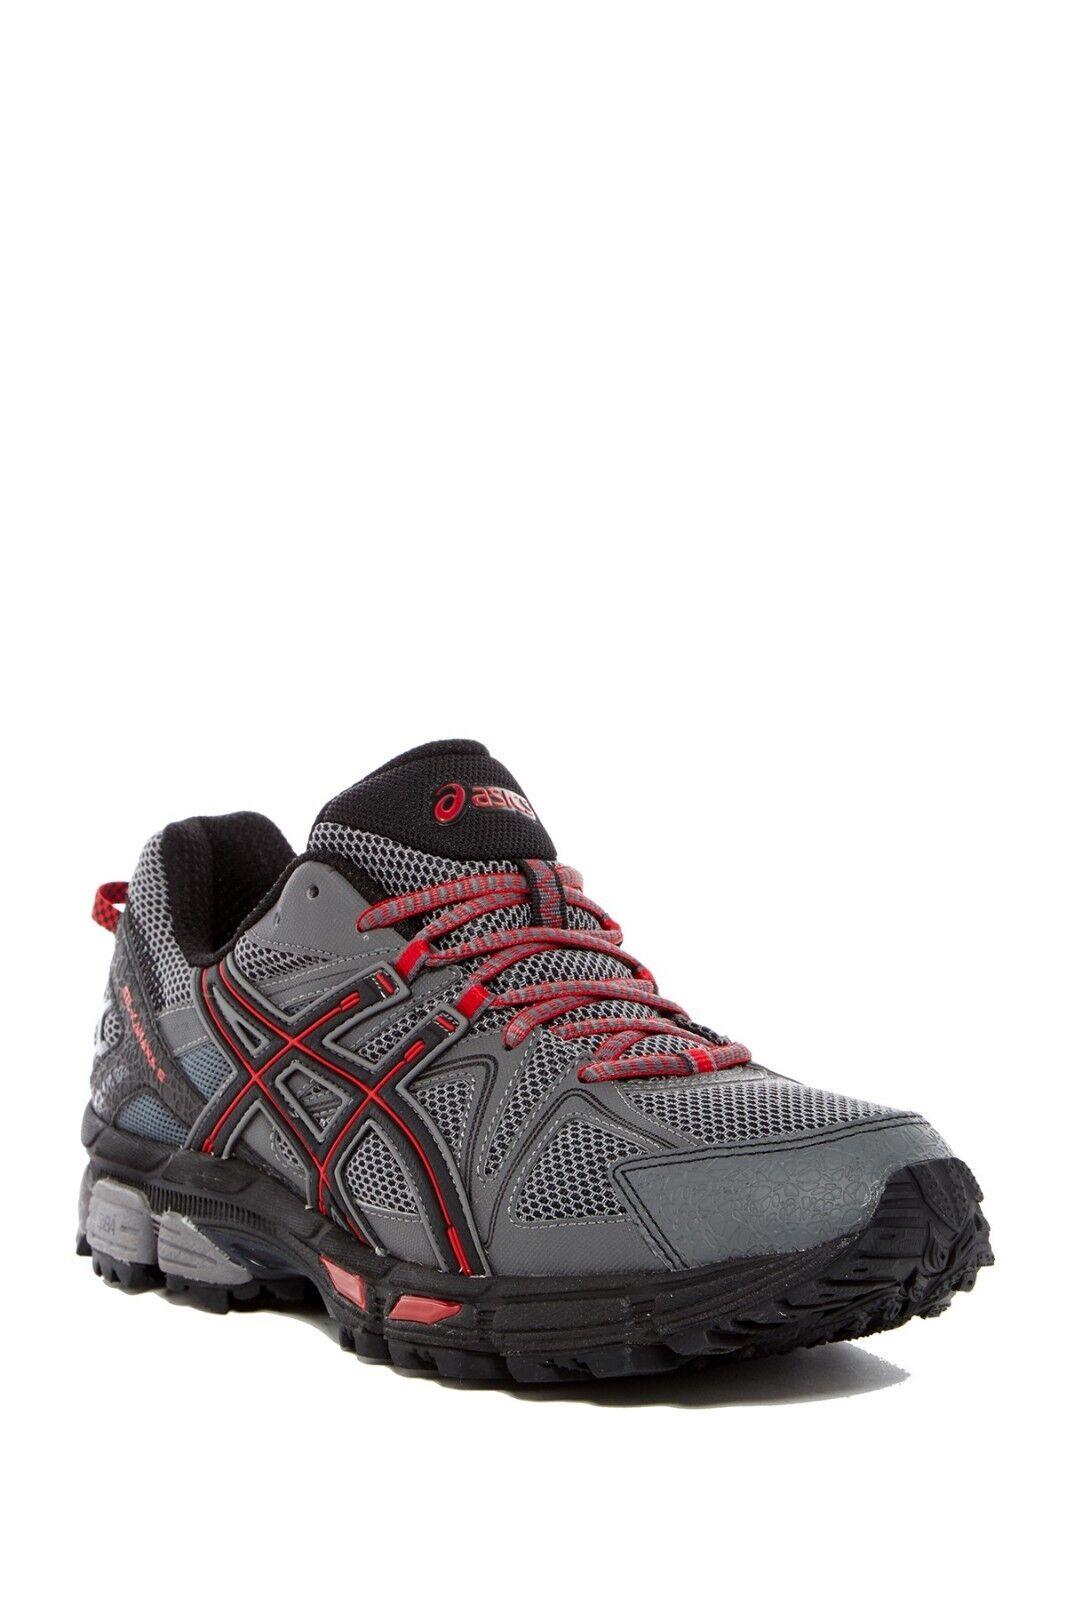 Mens ASICS NEW Gel BLACK RED TRUE SHARK 11 5 Sz shoes